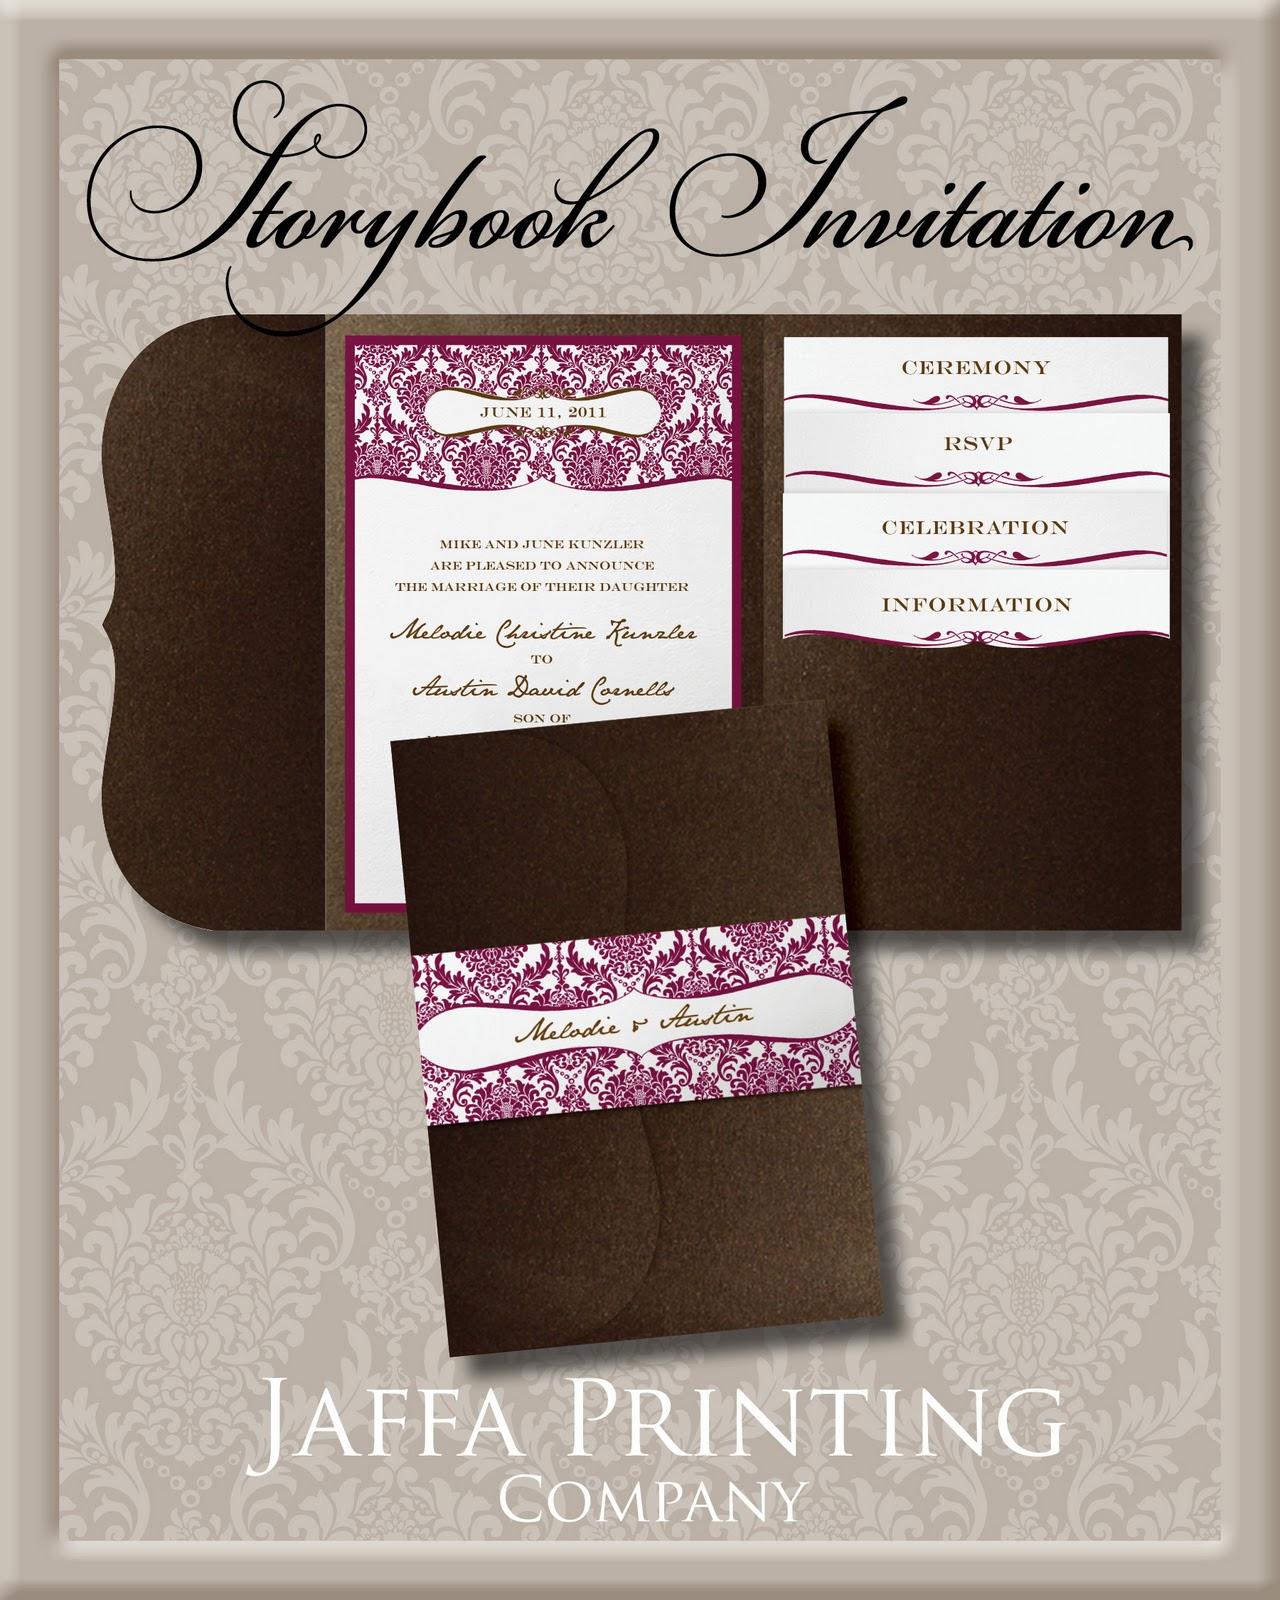 Wedding Invitations With Pockets: Wedding Invitation Blog: Pocket Invitation